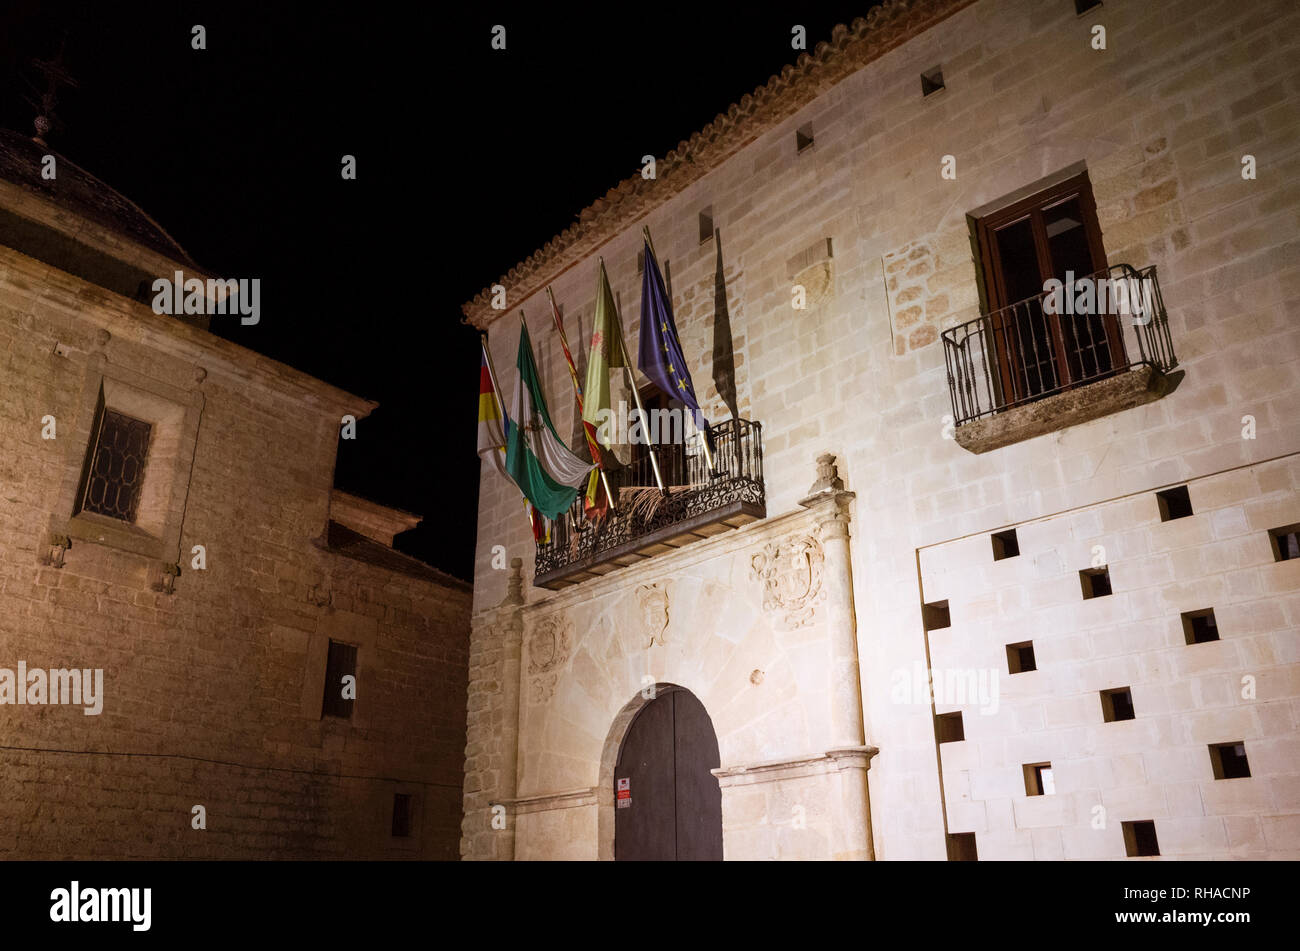 Castellar, Jaen province, Andalusia, Spain : Night view of the town hall placed at the Palacio de la Casa Ducal de Medinaceli in Plaza de la Constituc - Stock Image